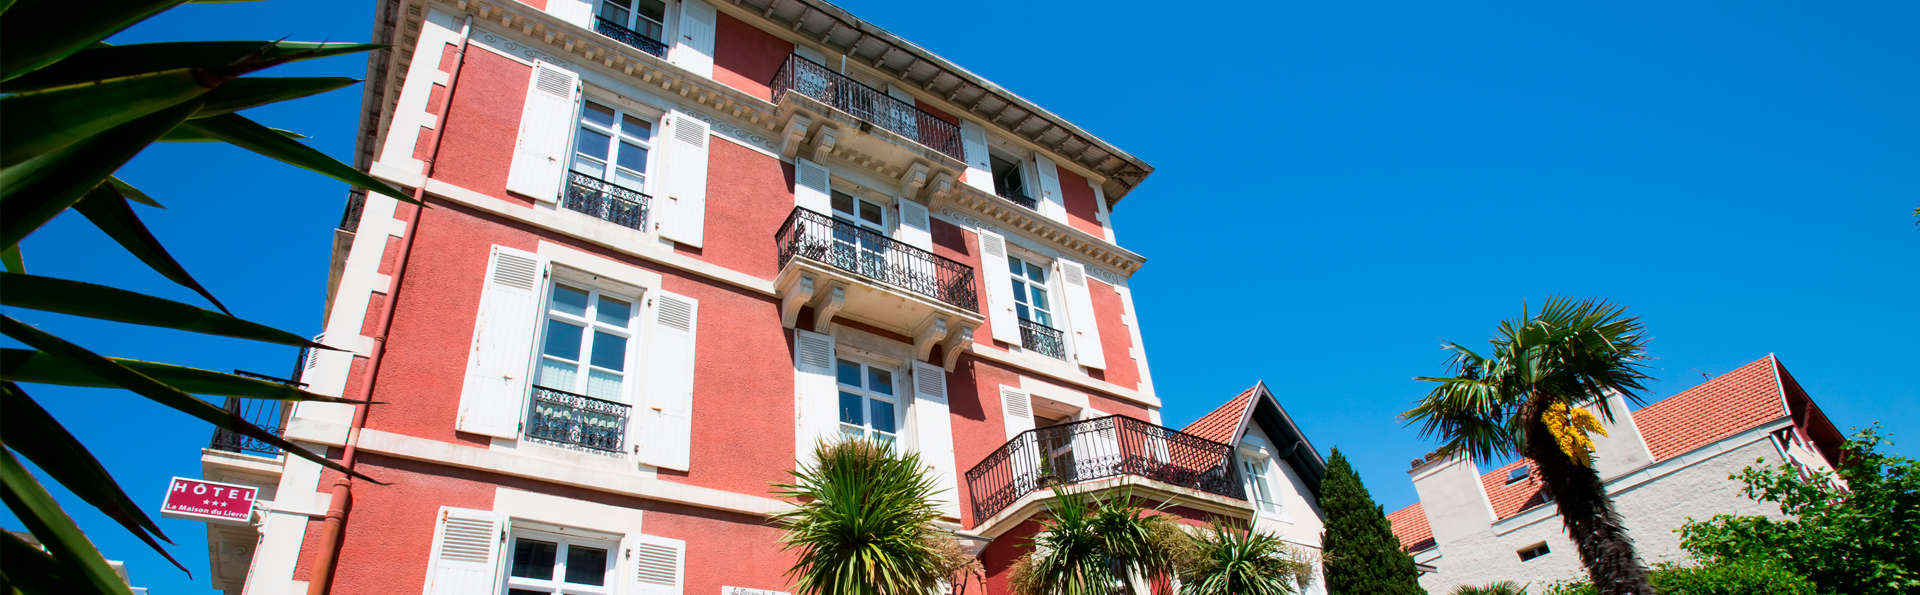 Week-end de charme à Biarritz